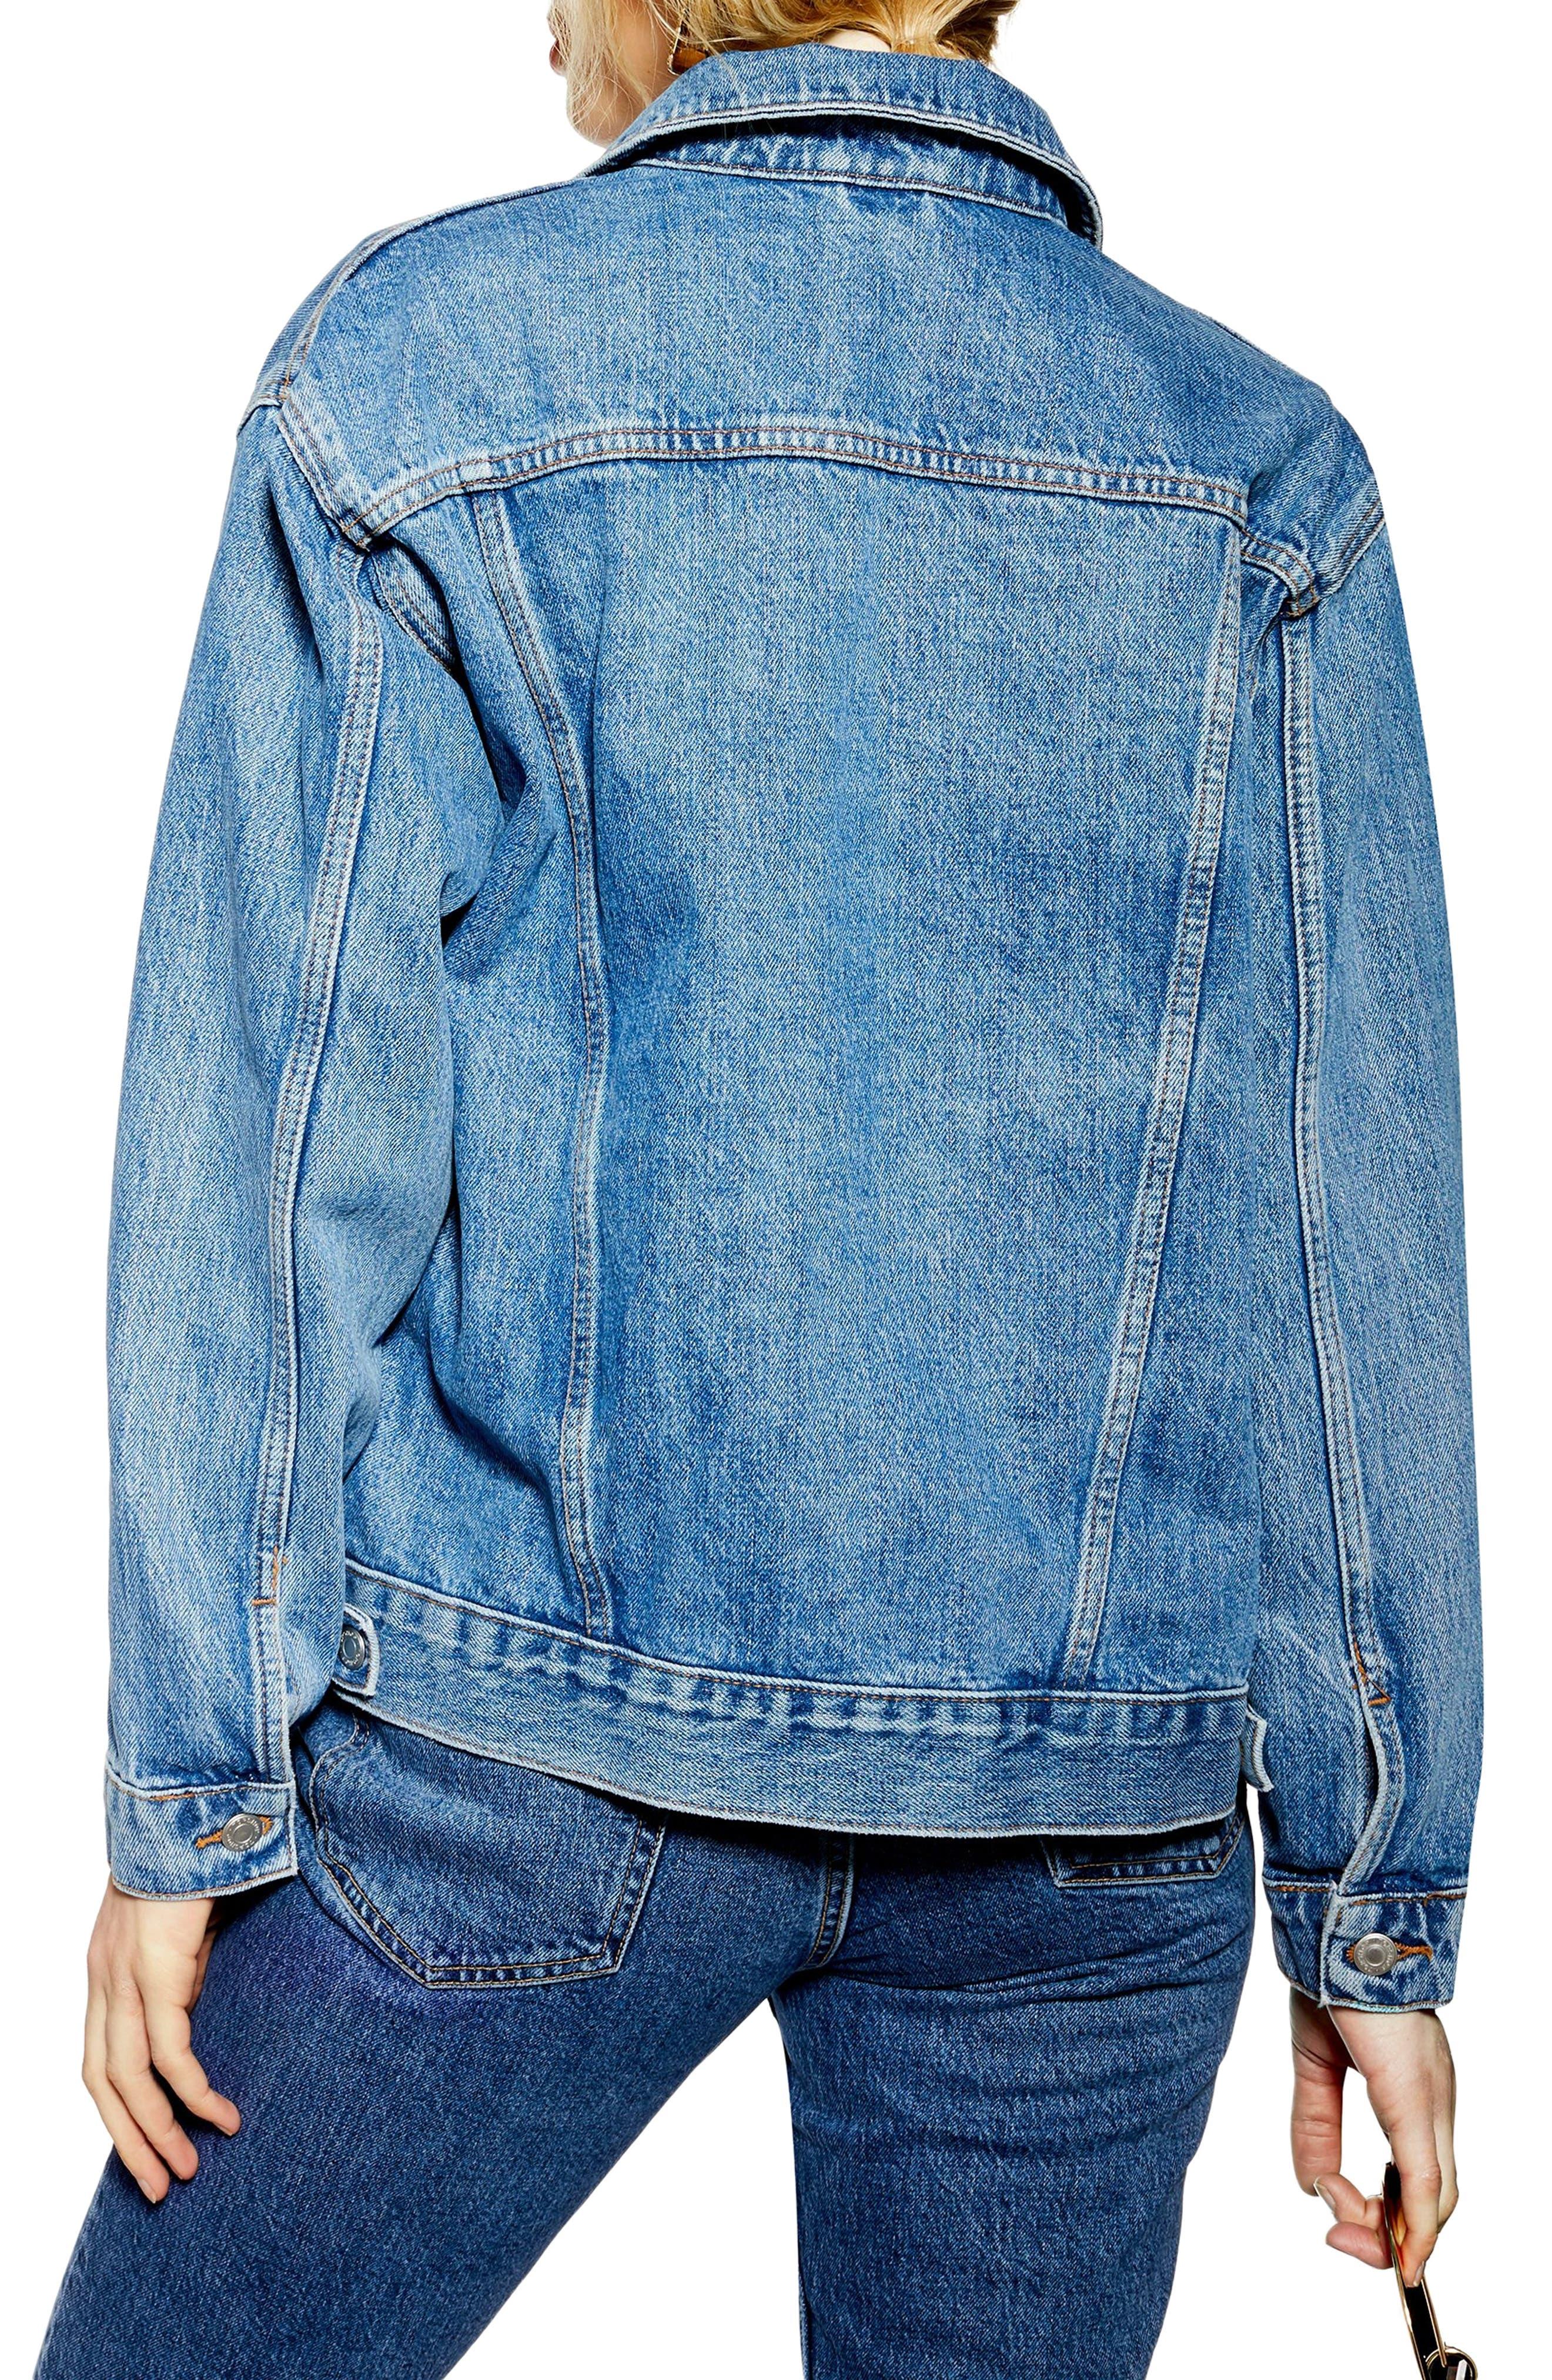 TOPSHOP, Oversized Denim Jacket, Alternate thumbnail 2, color, MID DENIM